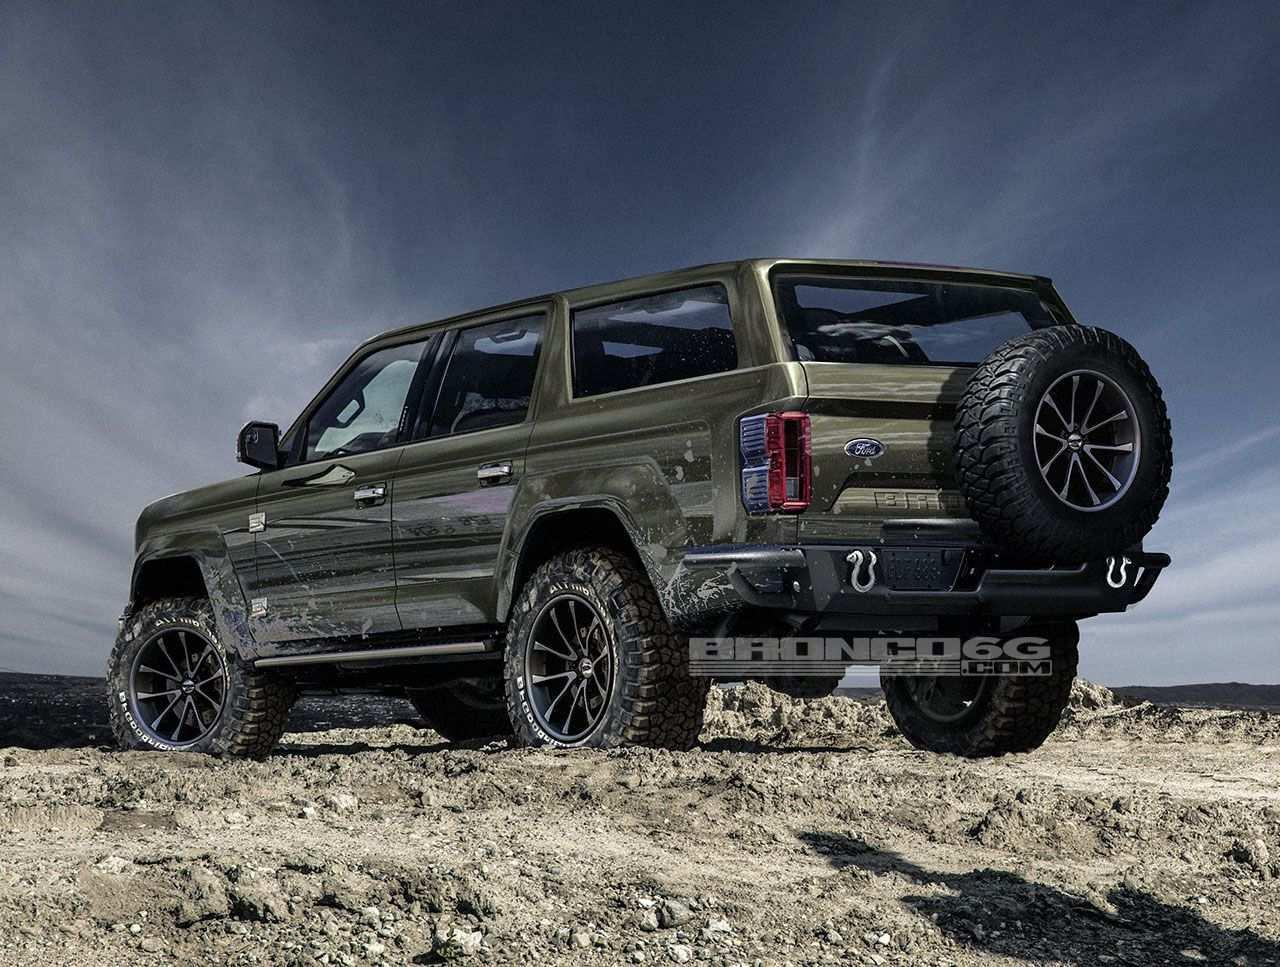 83 All New Ford Bronco 2020 4 Door Release for Ford Bronco 2020 4 Door